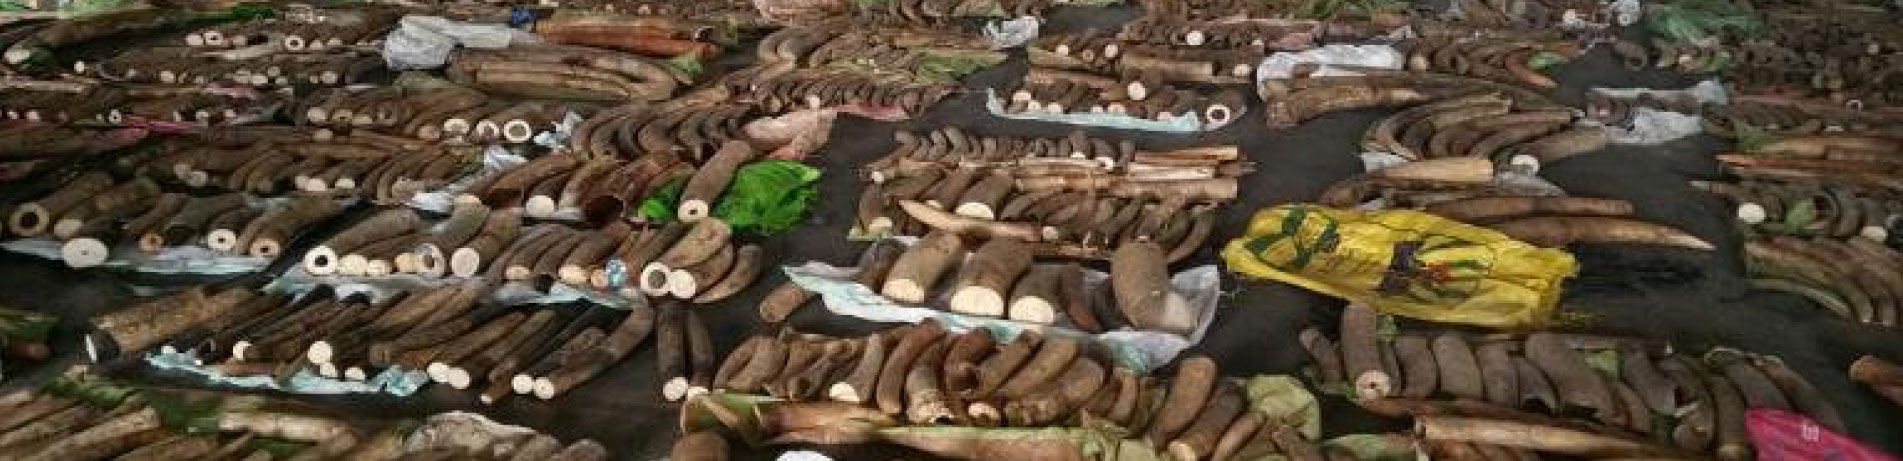 Seizure of ivory tusks, rhino horns and big cat teeth on display